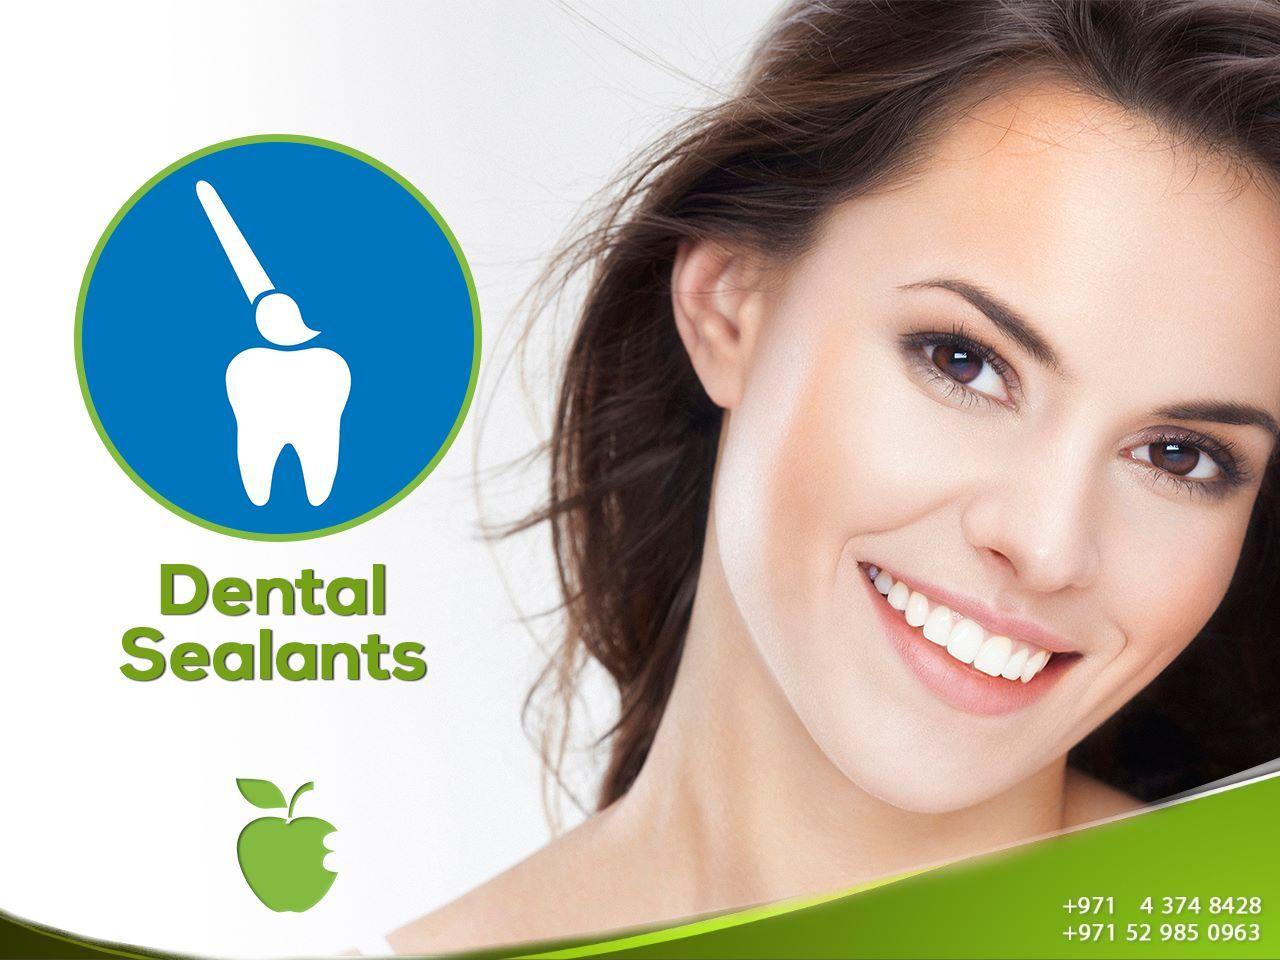 Dental sealants dental decay on the back teeth premolars